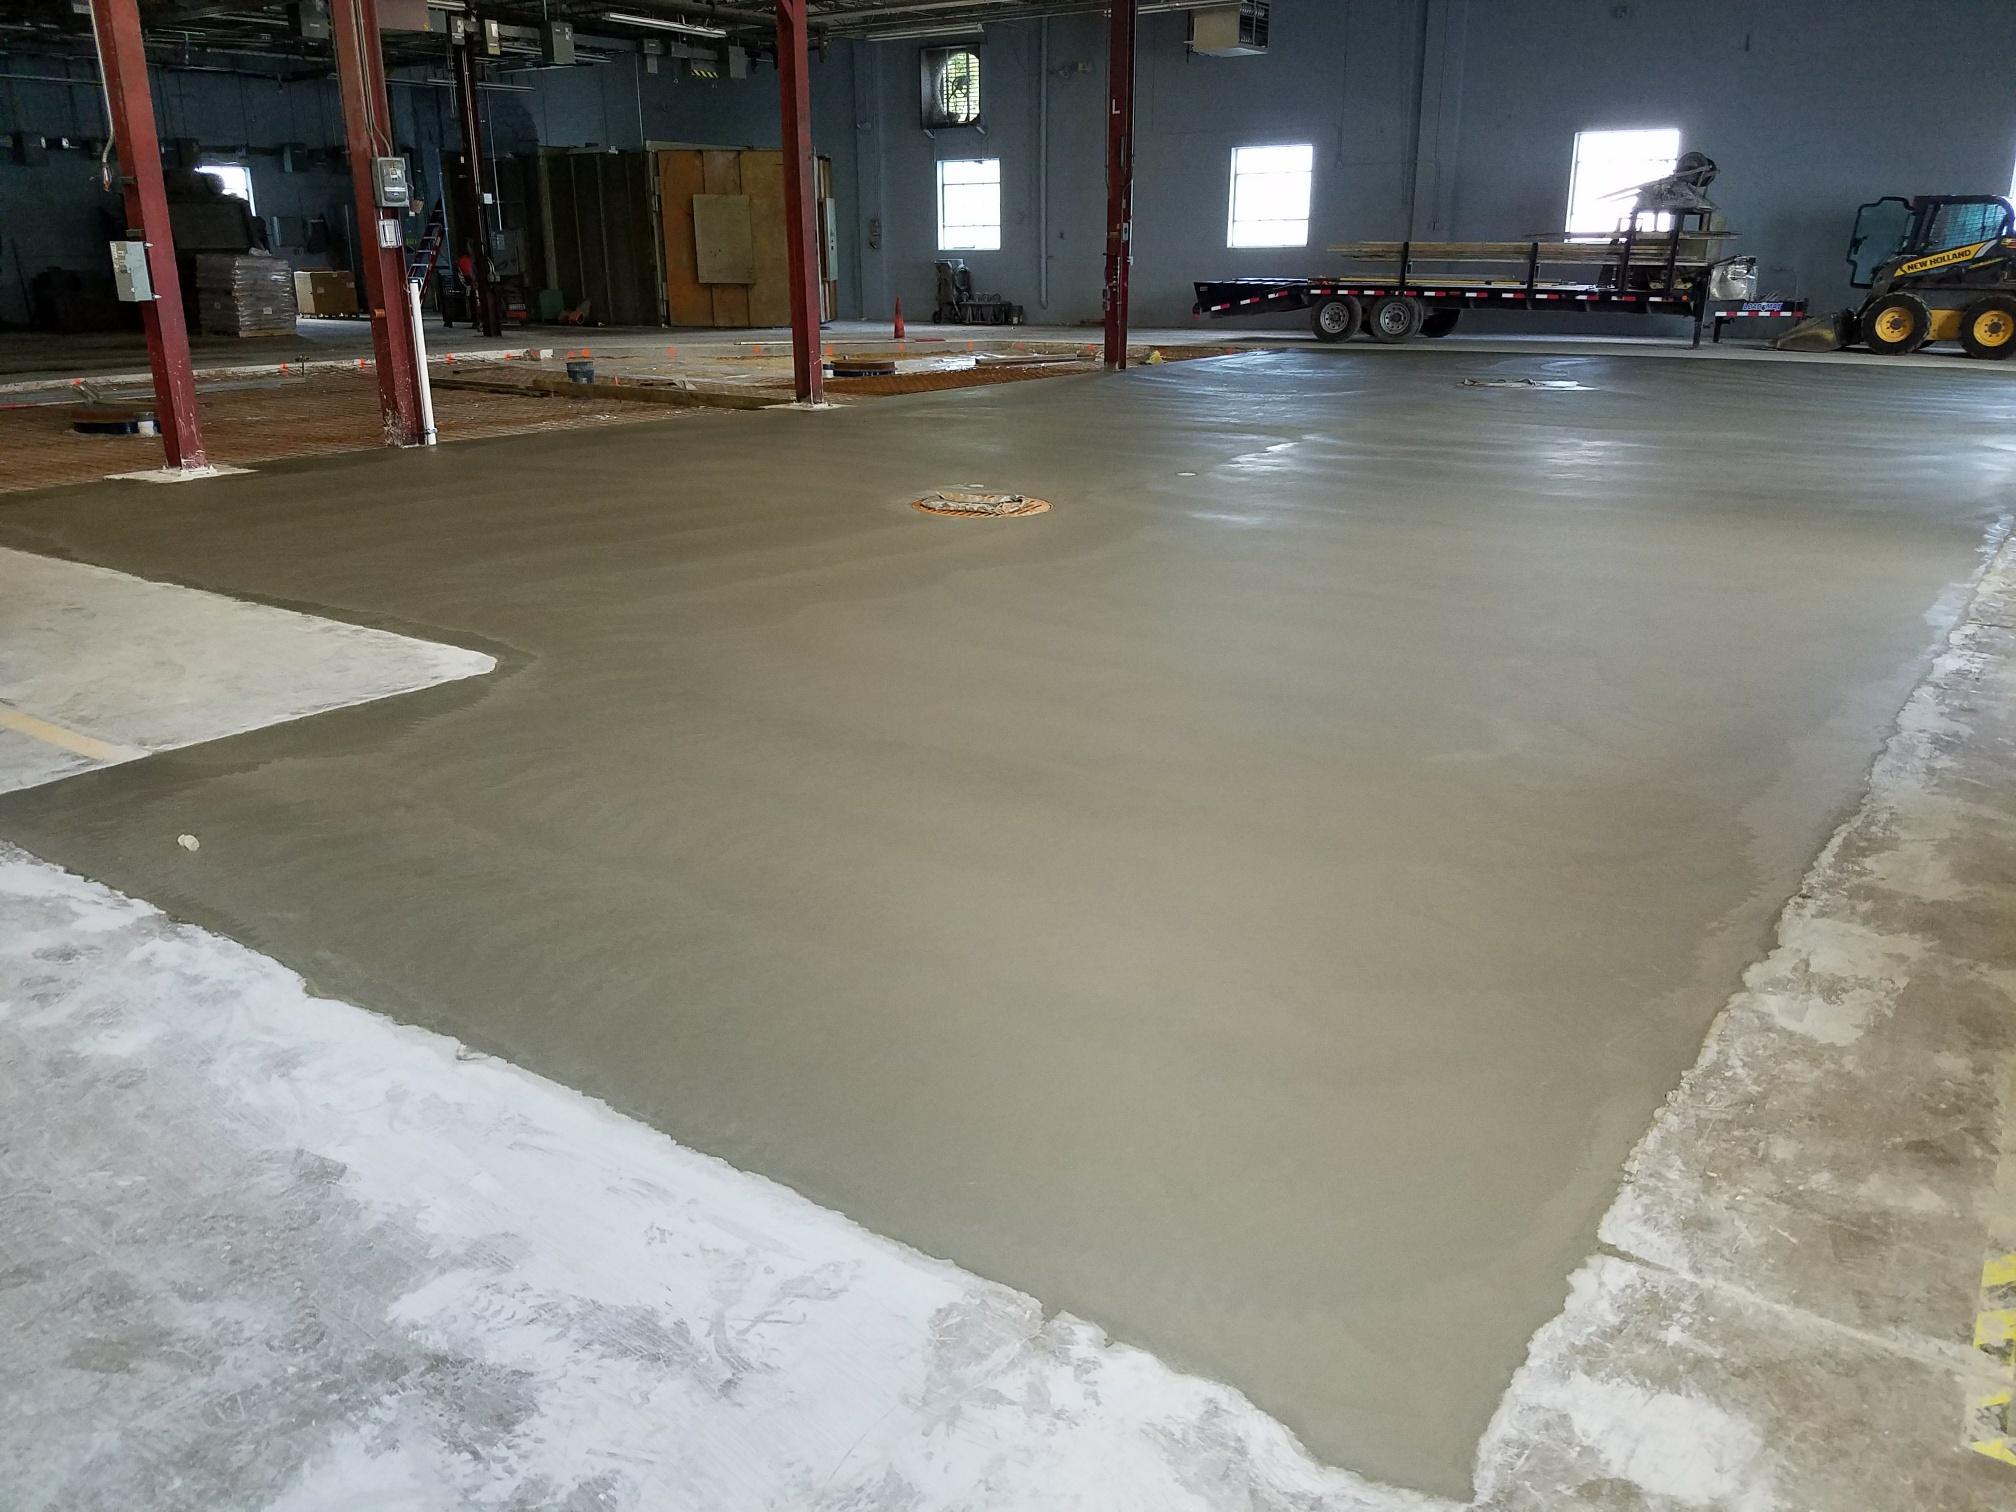 EFCO Metal Finishing installs new floor for vibratory finishing in Menomonee Falls, WI location